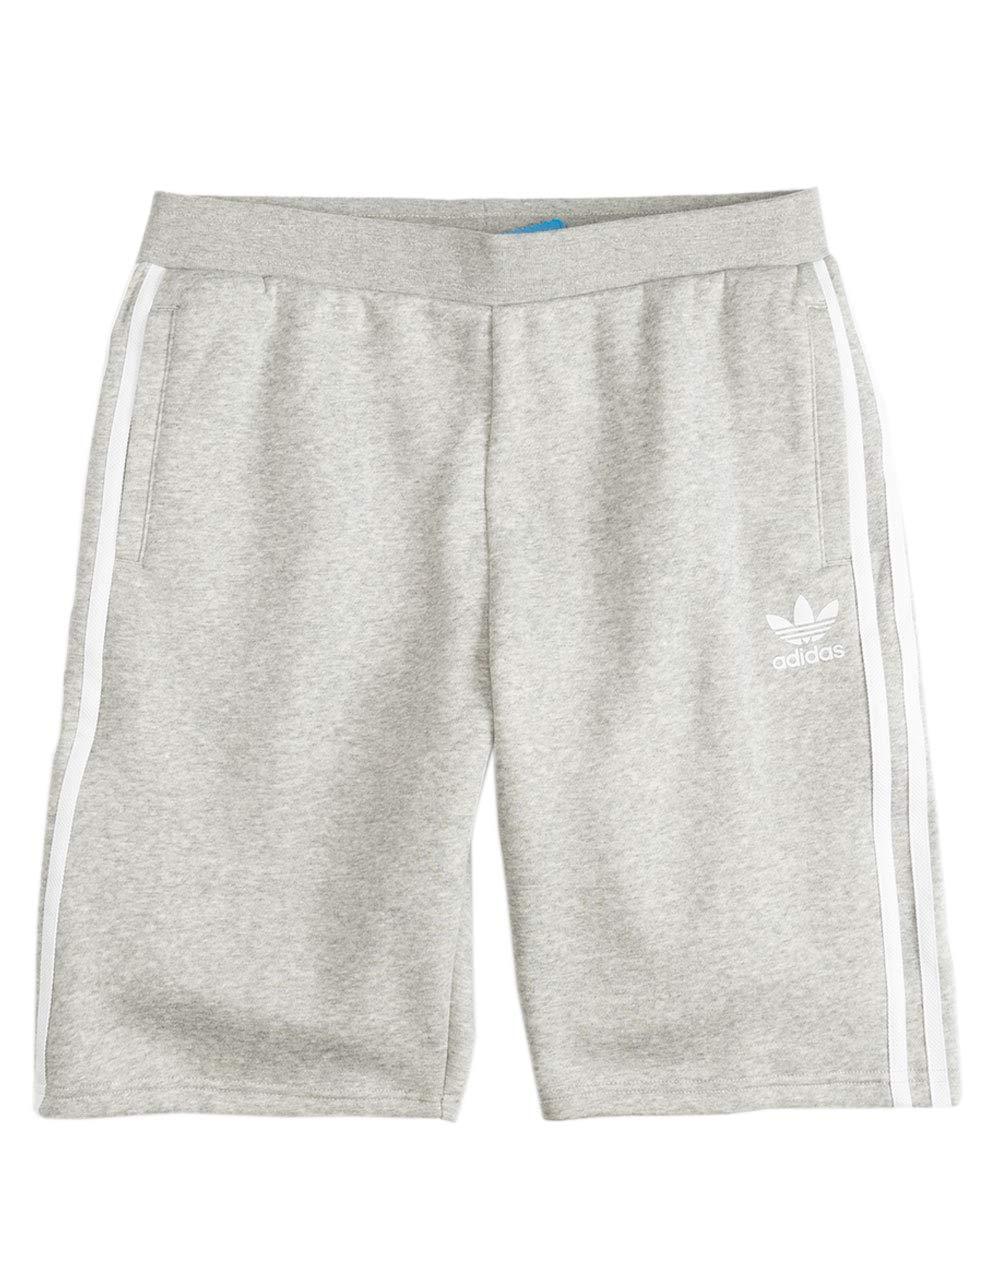 adidas Trefoil Heather Gray Boys Sweat Shorts, Heather Grey, Medium